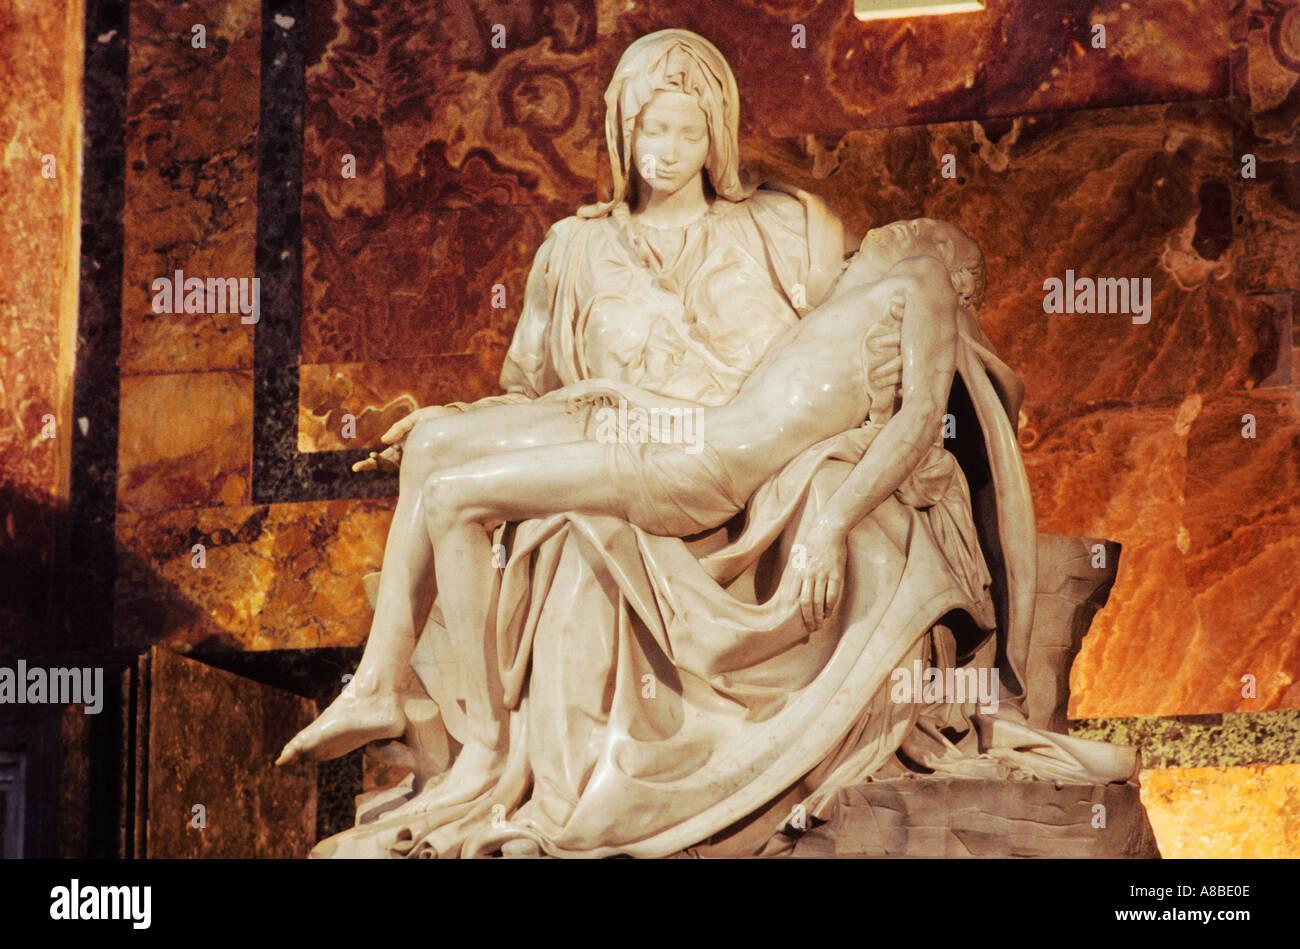 La Pieta by Michelangelo St Peter s Basilica Rome Italy - Stock Image